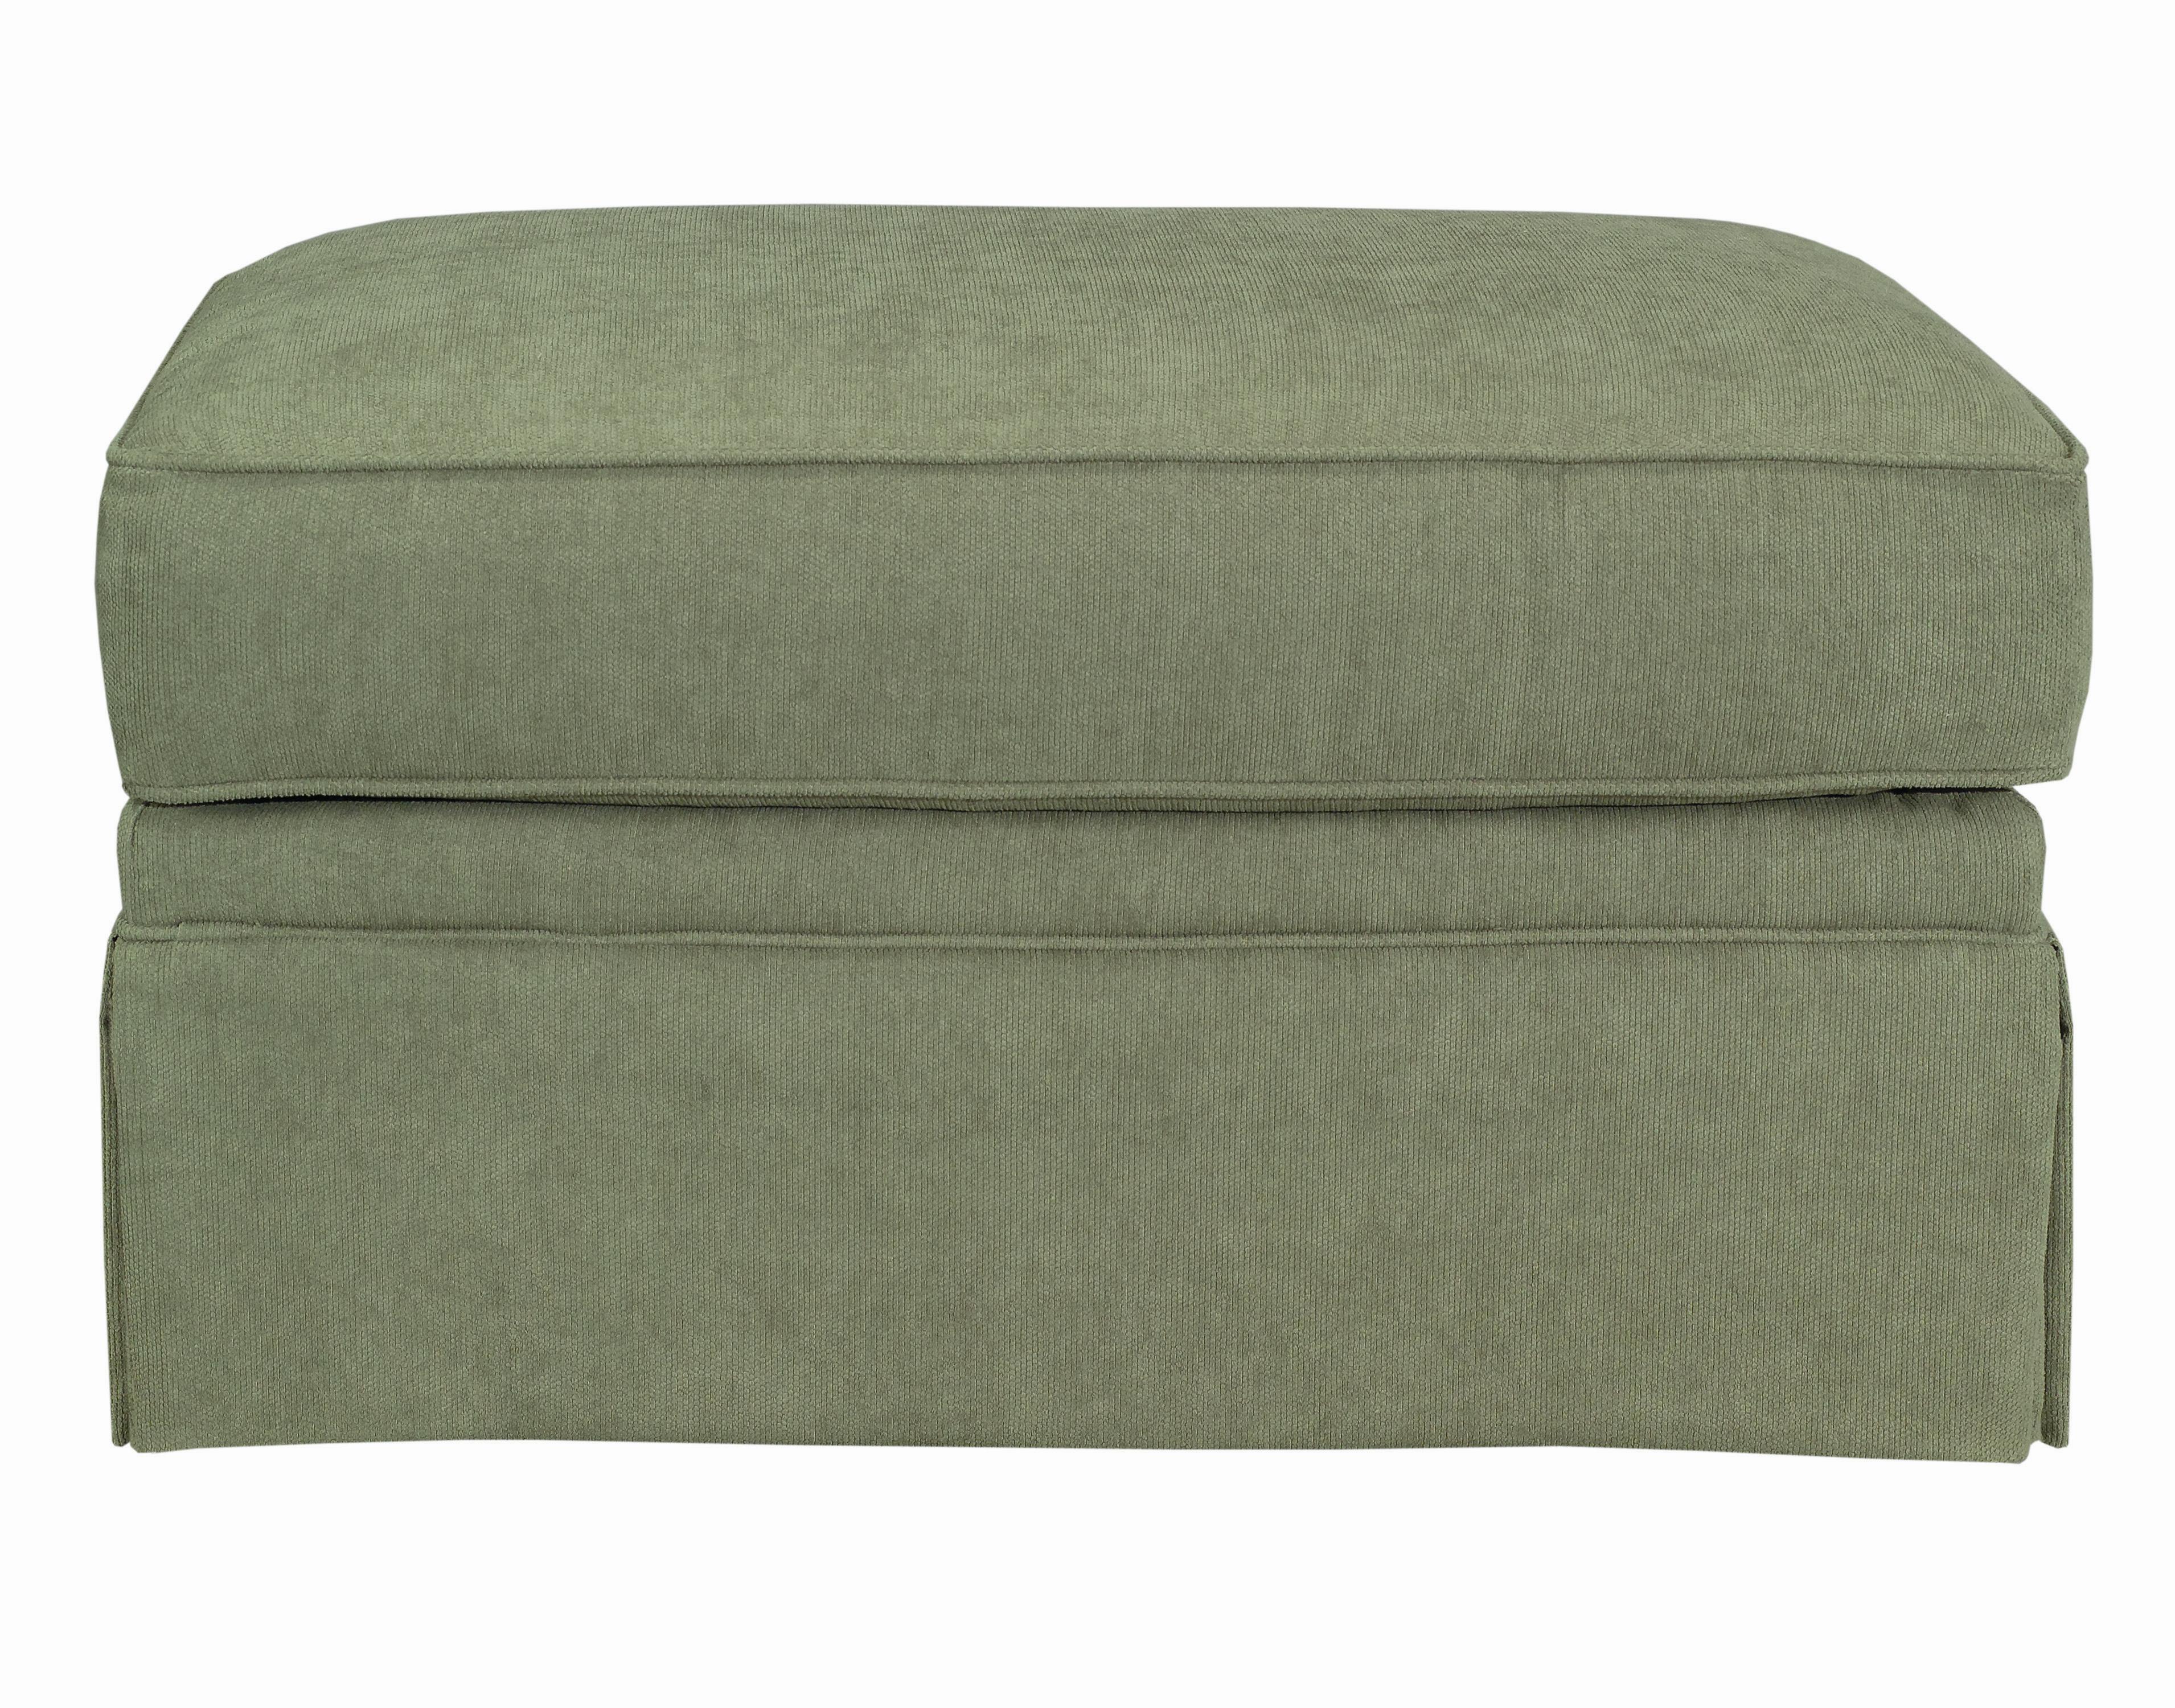 Charlotte Ottoman by Kincaid Furniture at Johnny Janosik